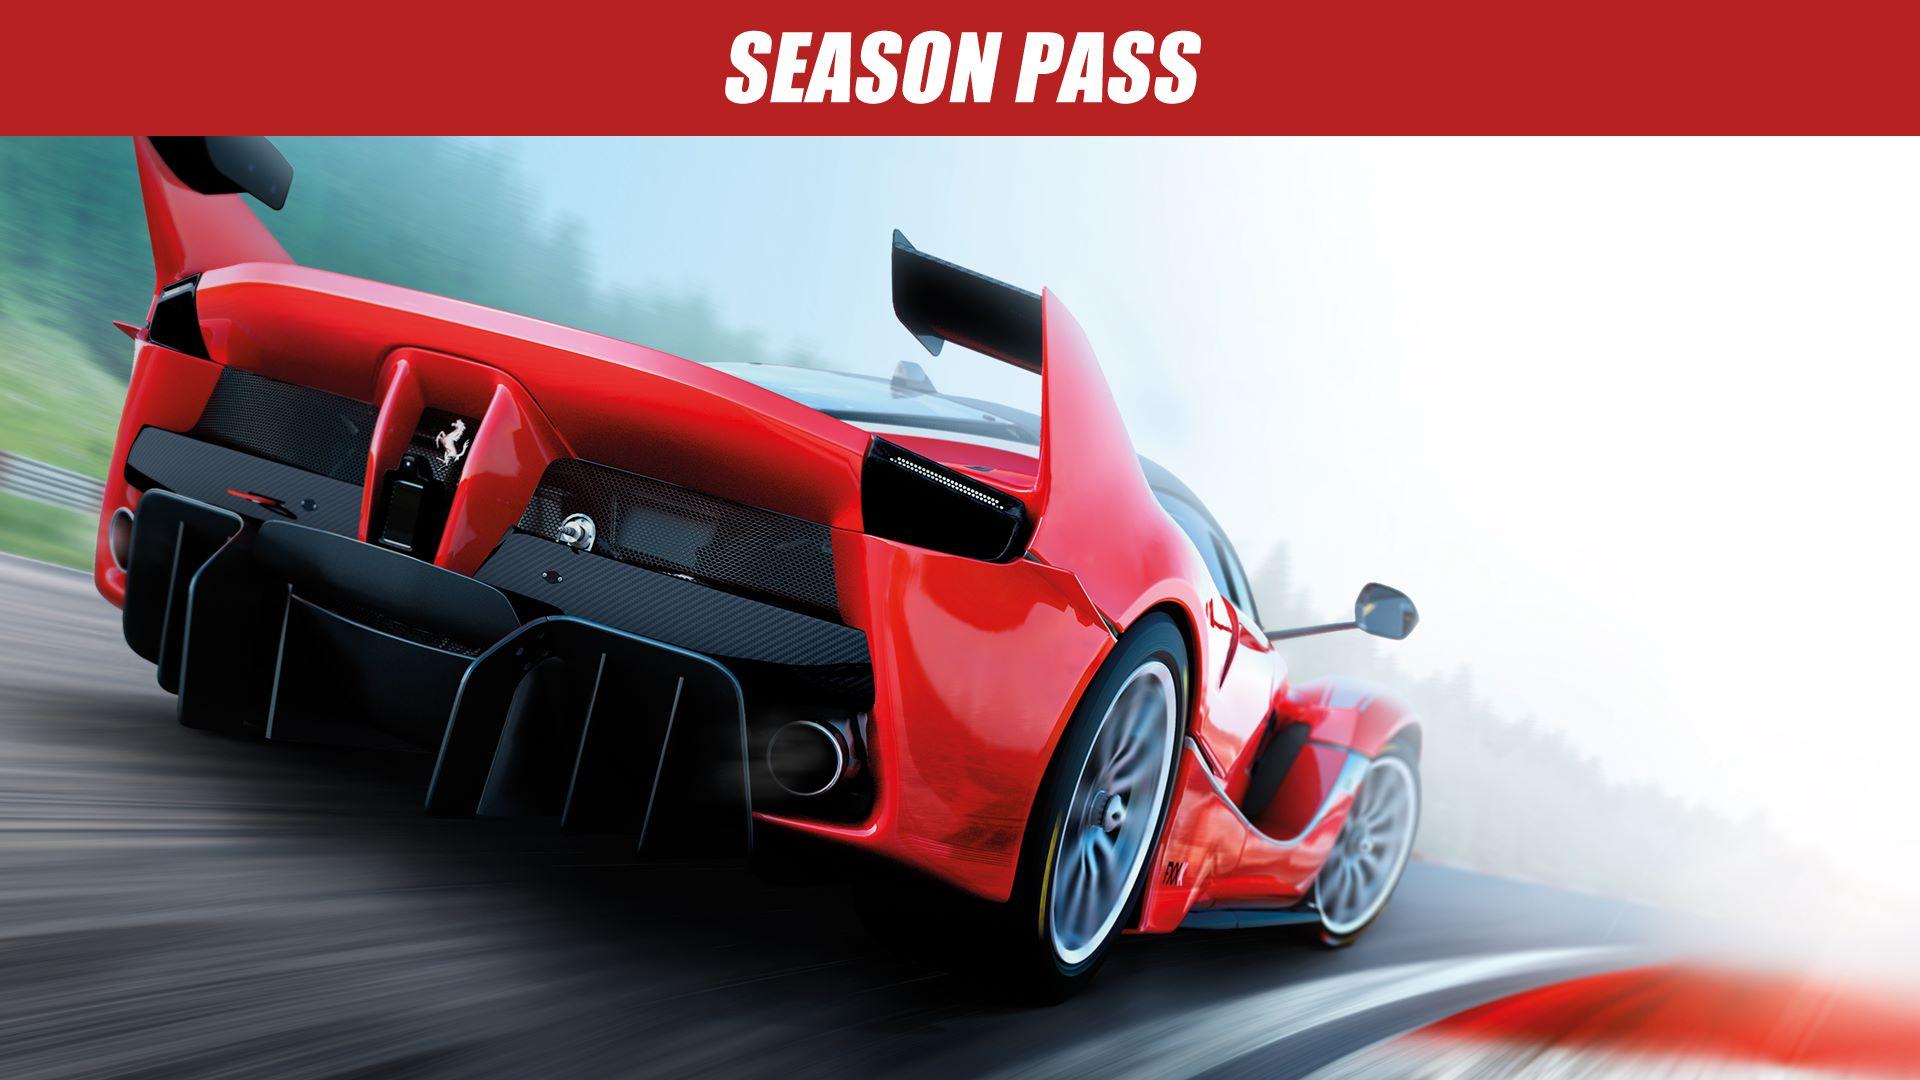 Buy Assetto Corsa - DLC Season Pass - Microsoft Store 1b858b449538